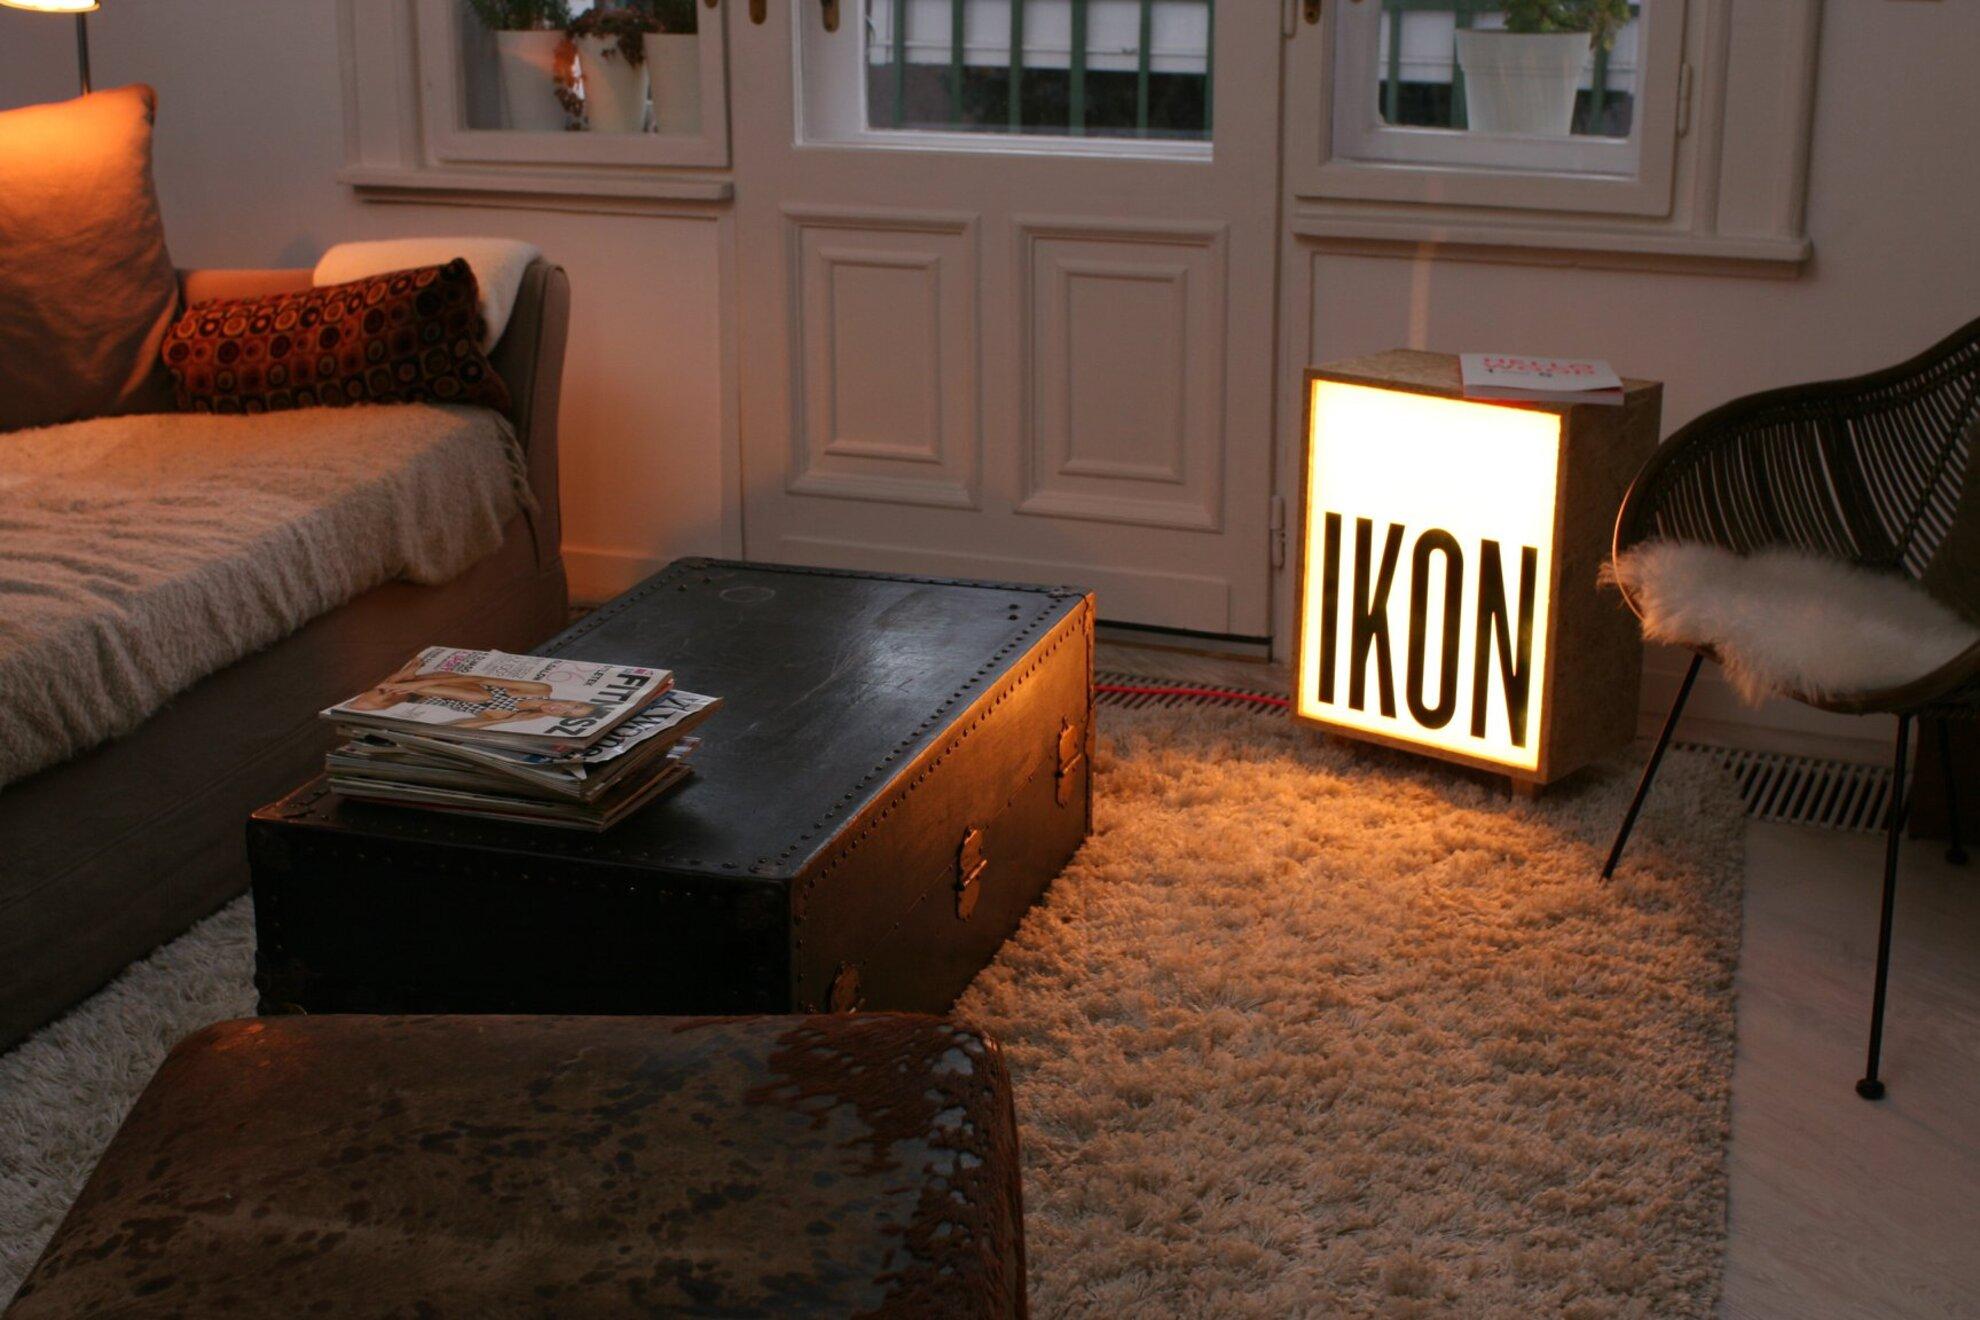 Lightbox workshop